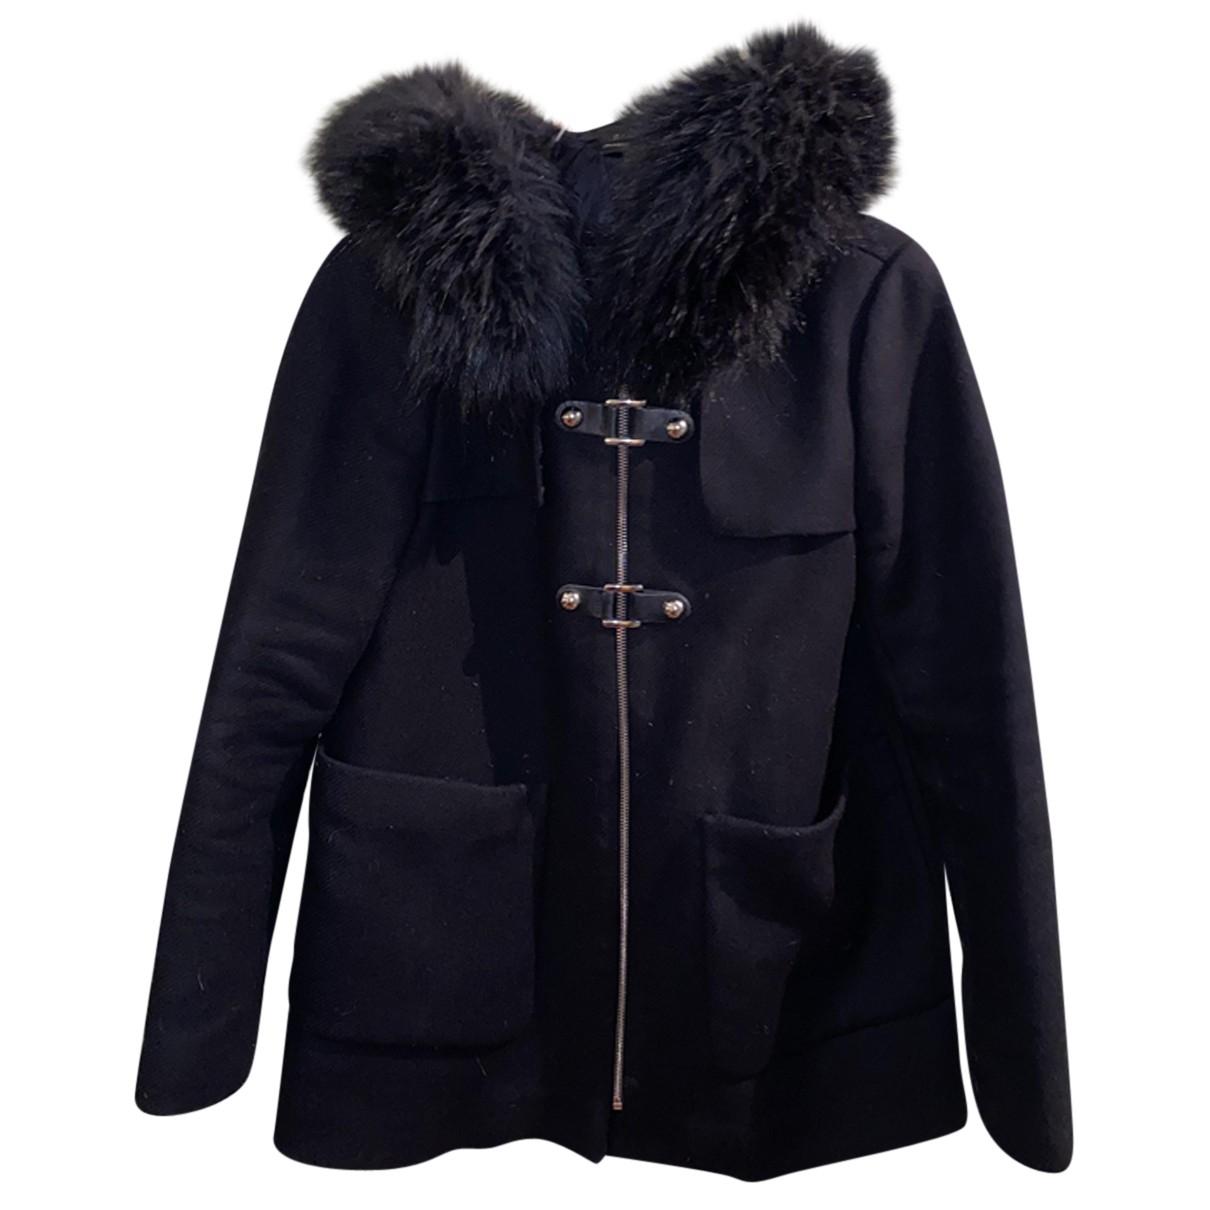 Zara N Black Wool coat for Women S International